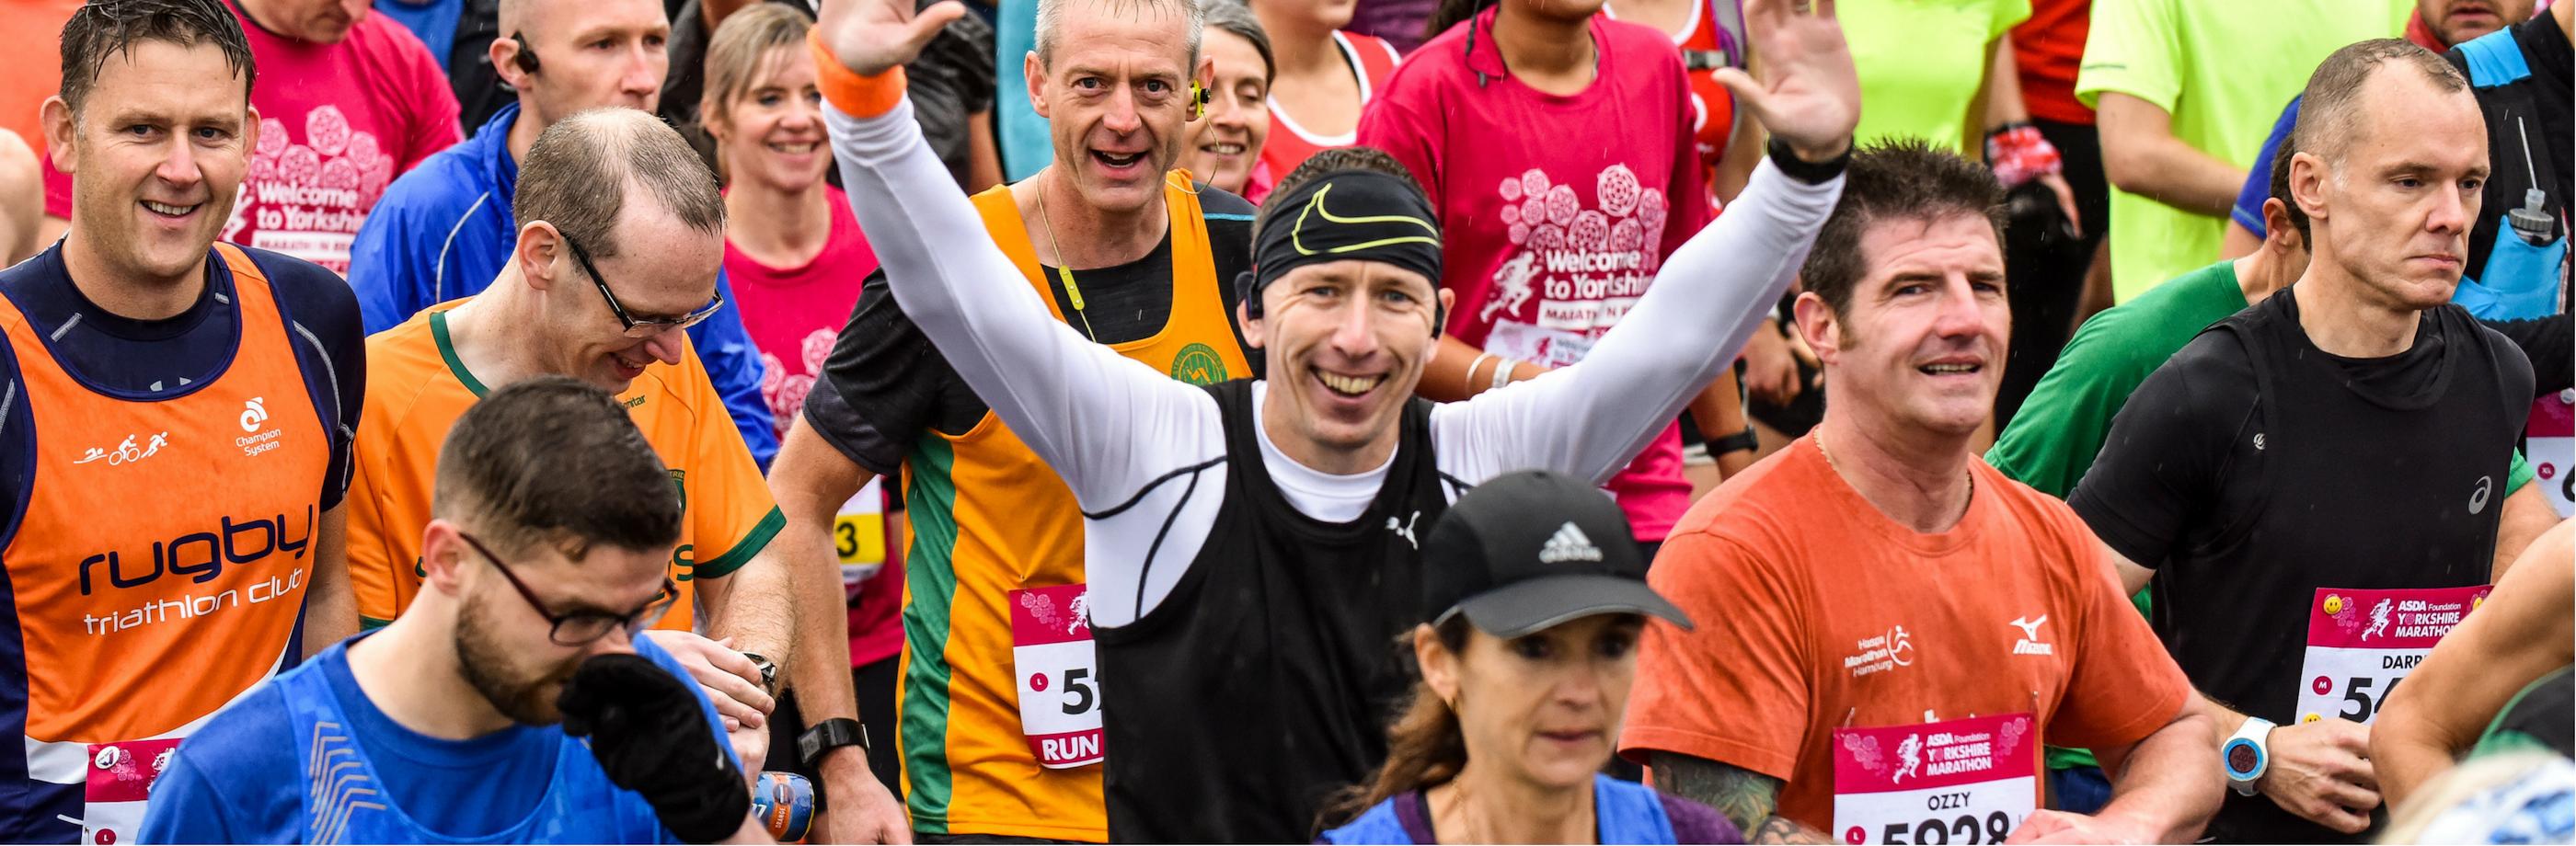 *Grand Prix* Yorkshire Marathon / 10M